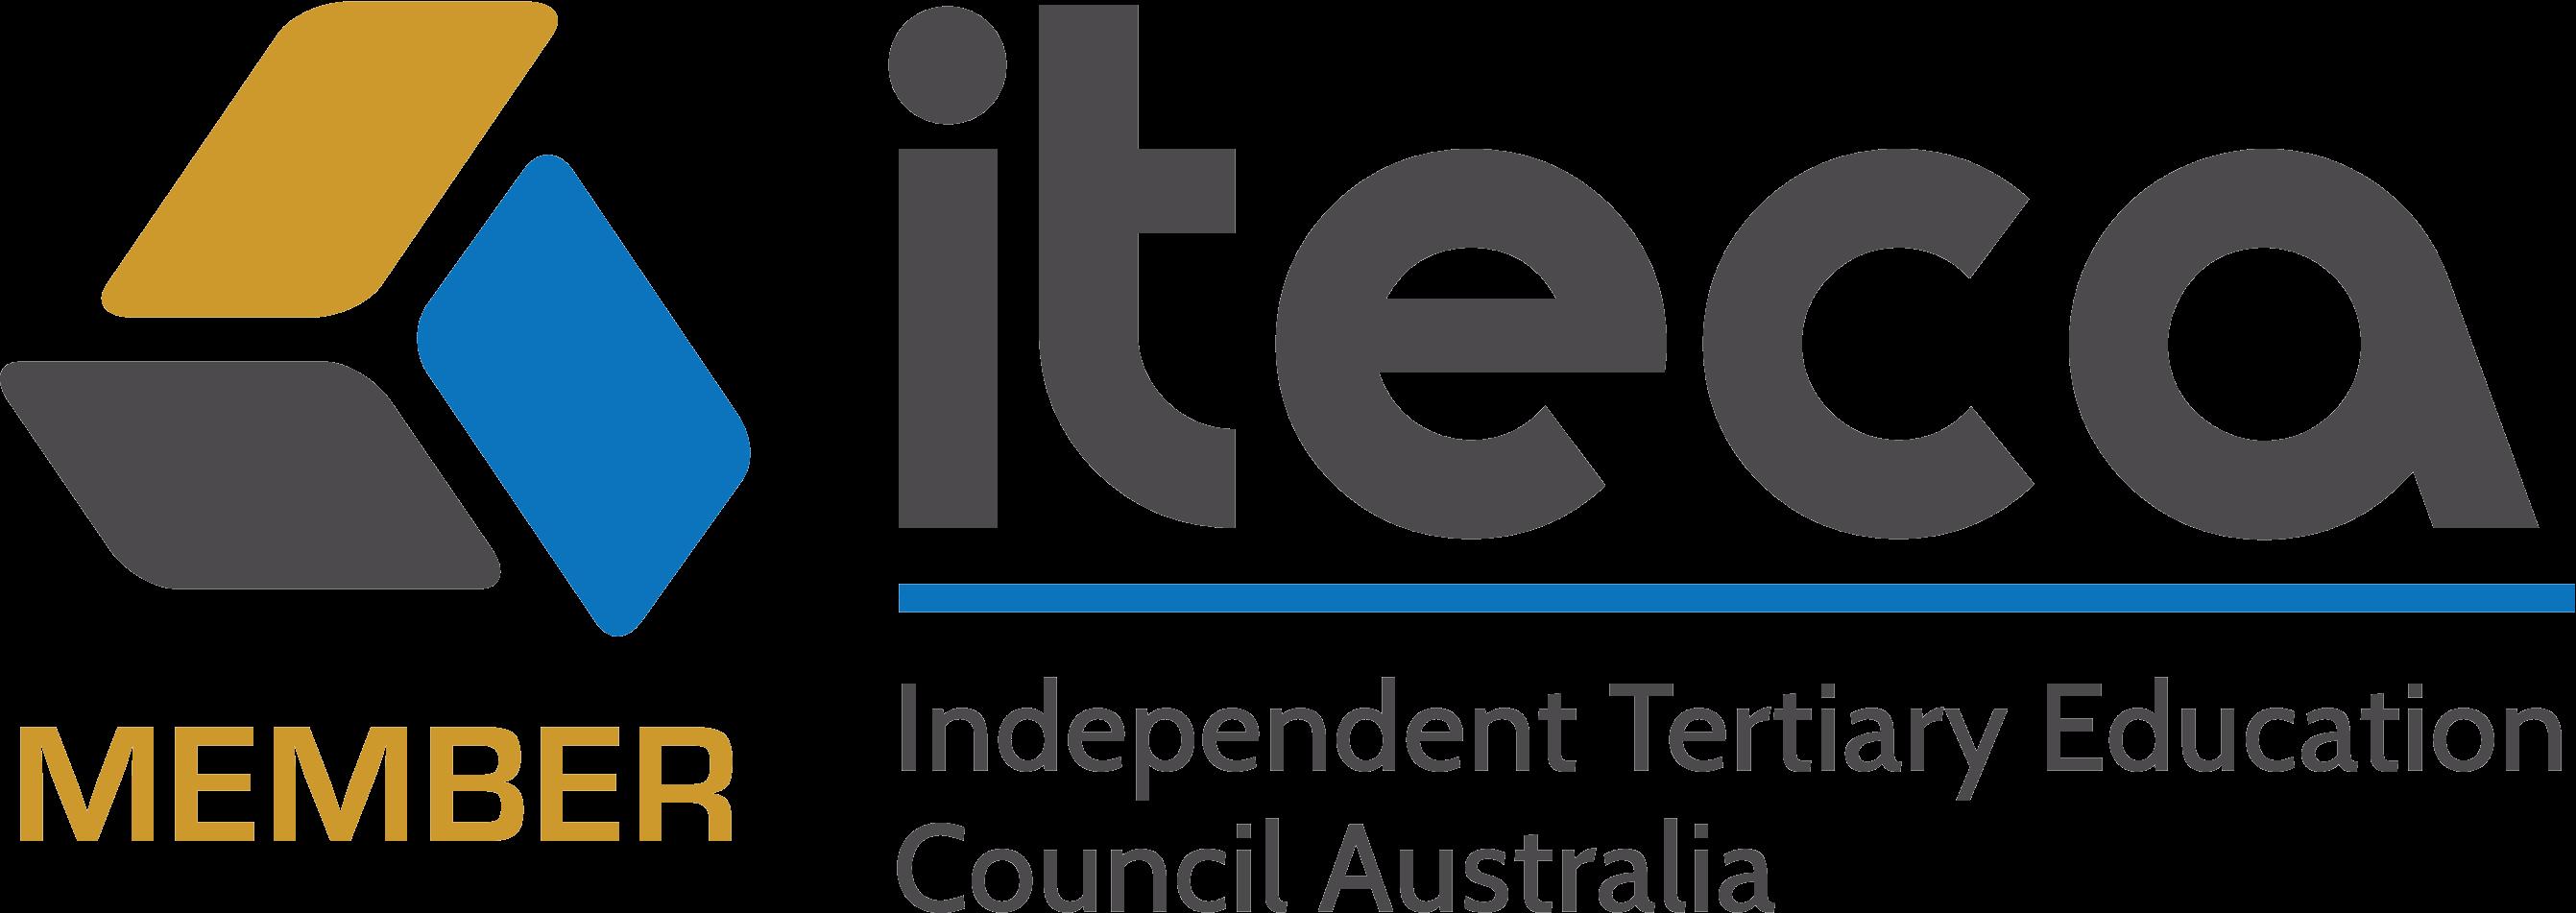 iteca membership logo